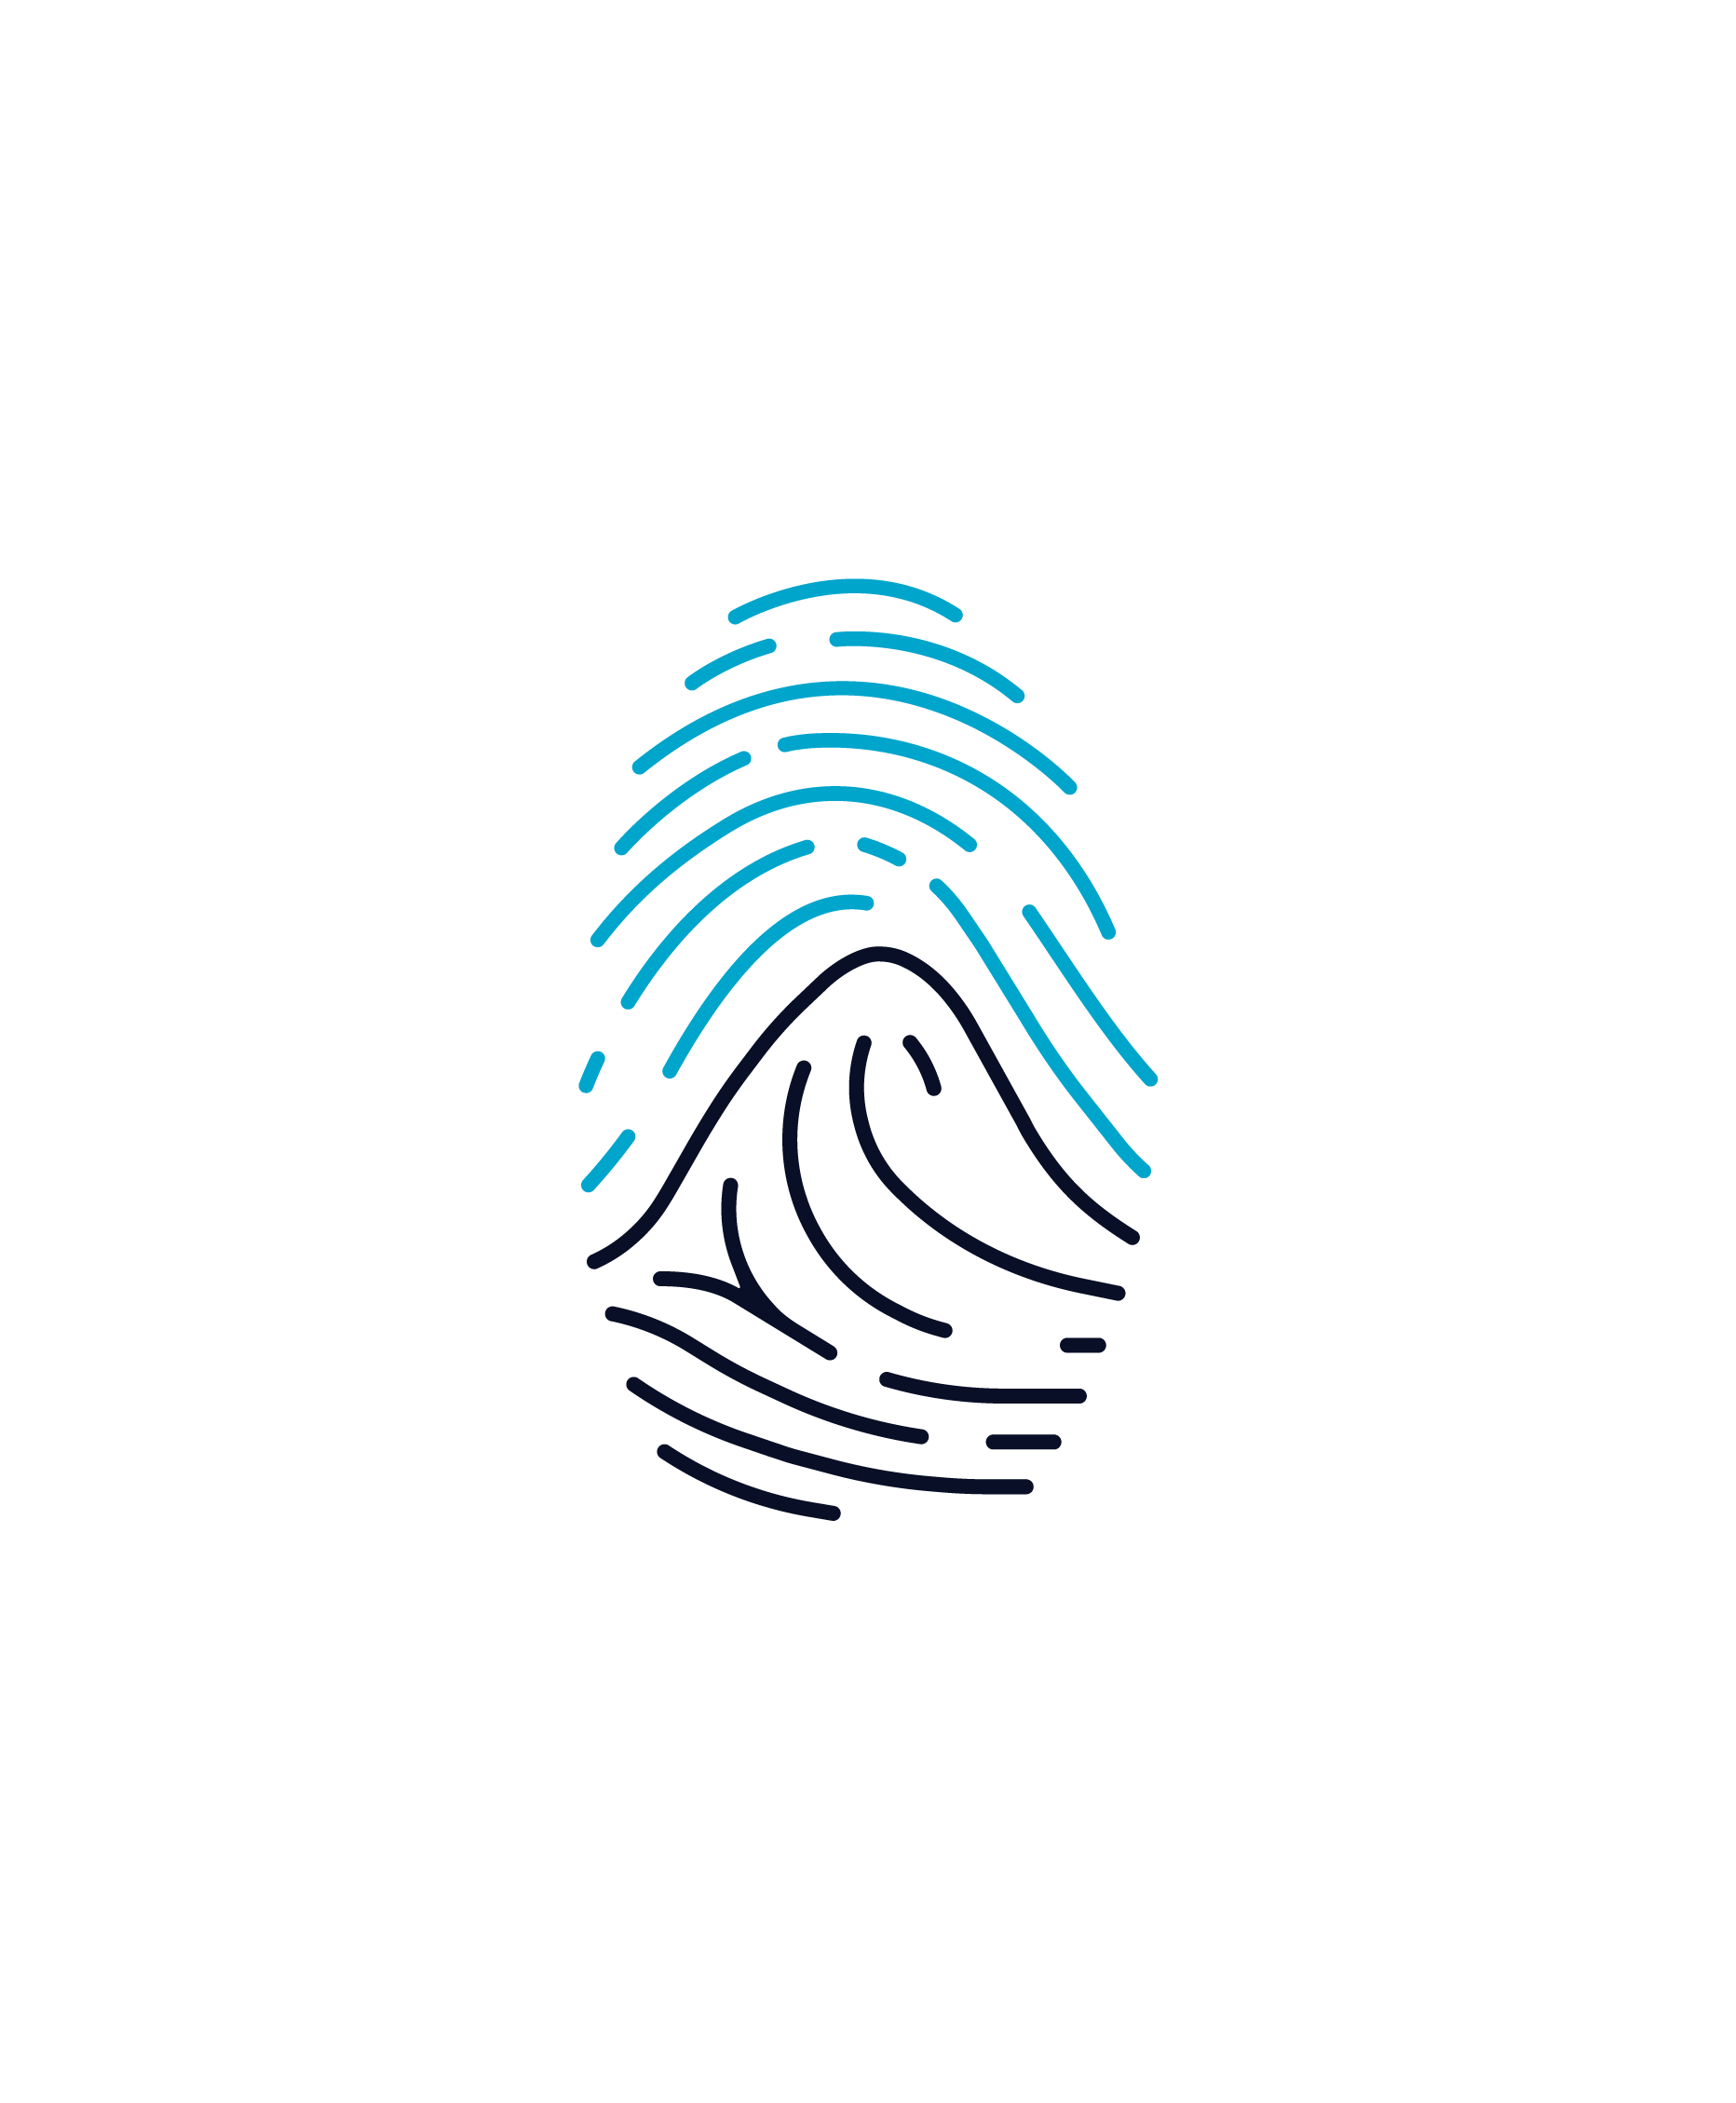 SR_Fingerprint_RGB-01.png